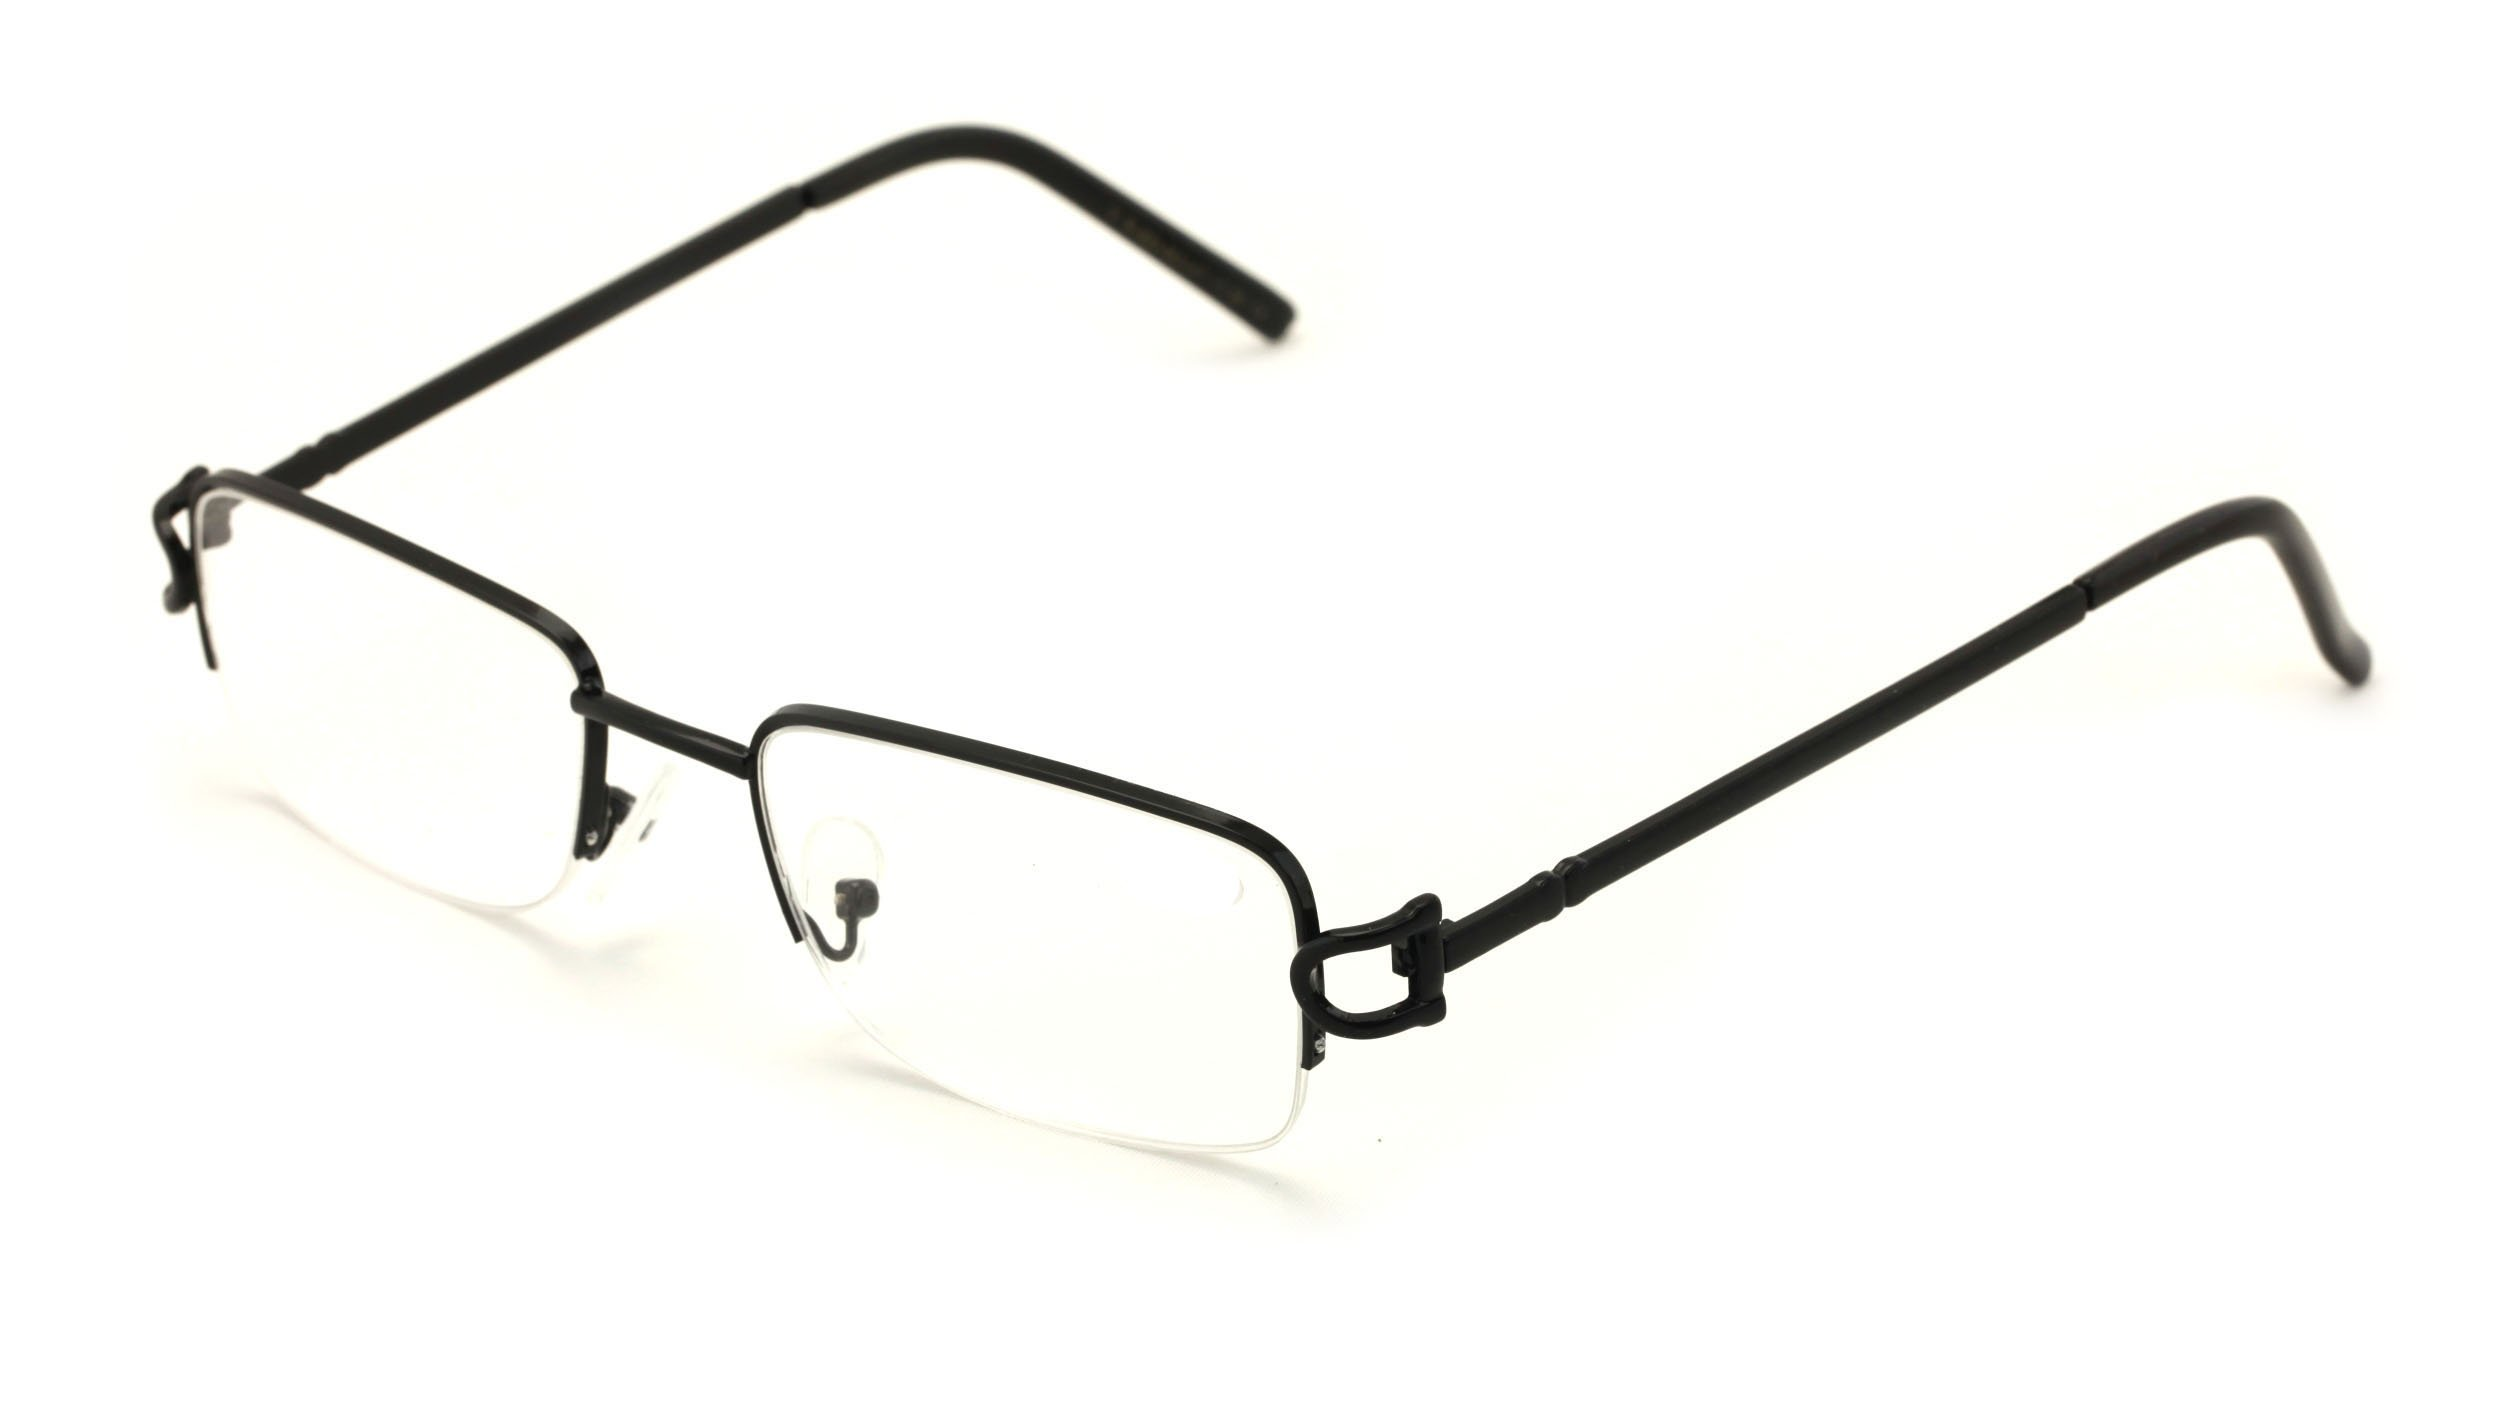 V.W.E. Rectangular Frame Clear Lens Designer Sunglasses RX Optical Eye Glasses (Black, Clear) by Vision World Eyewear